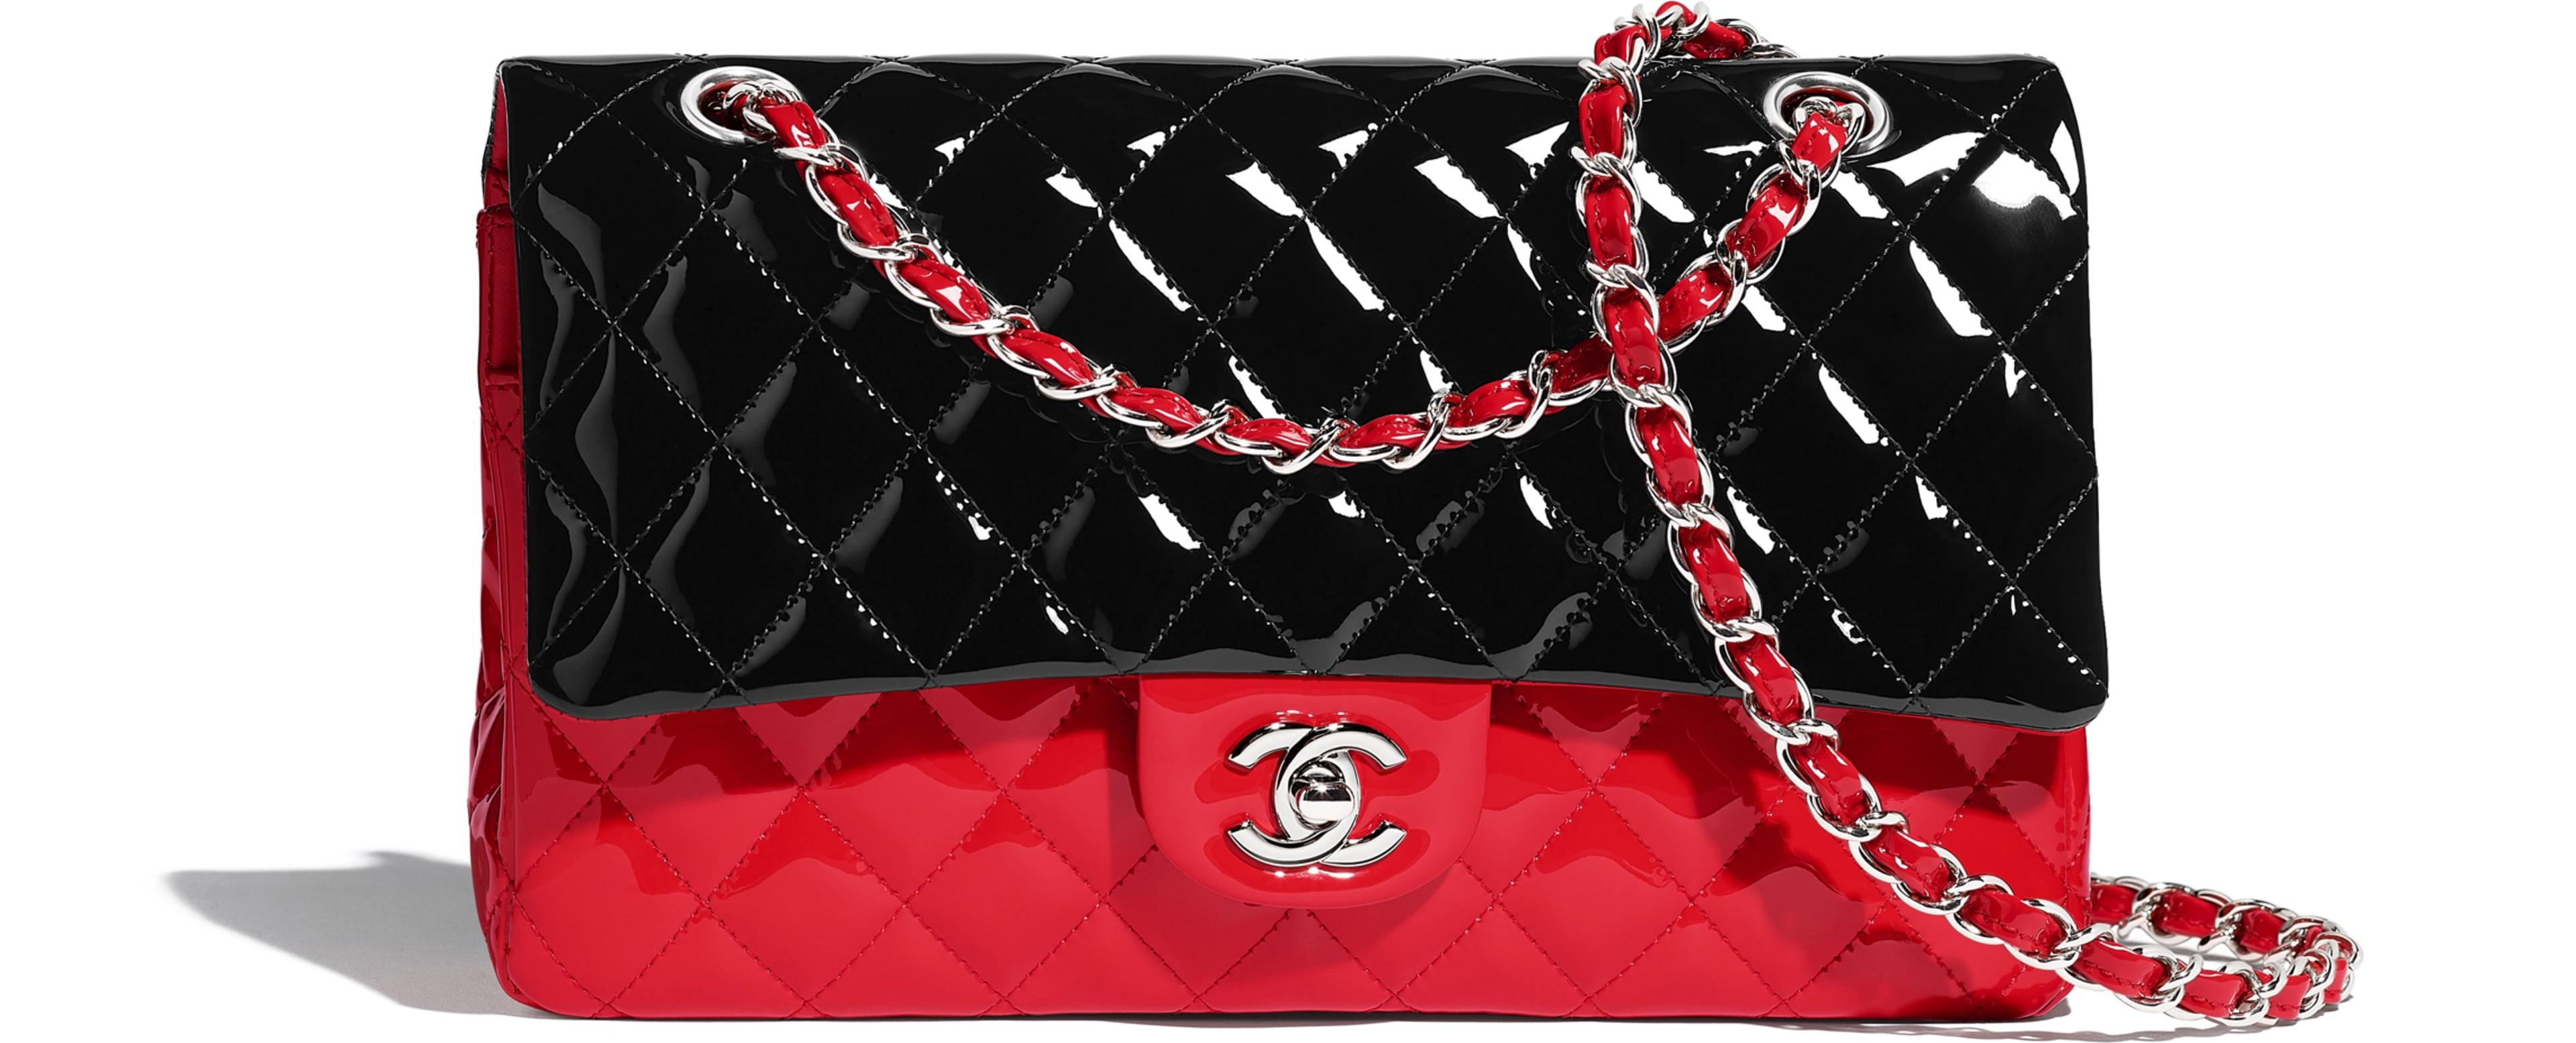 Patent Calfskin Black & Red